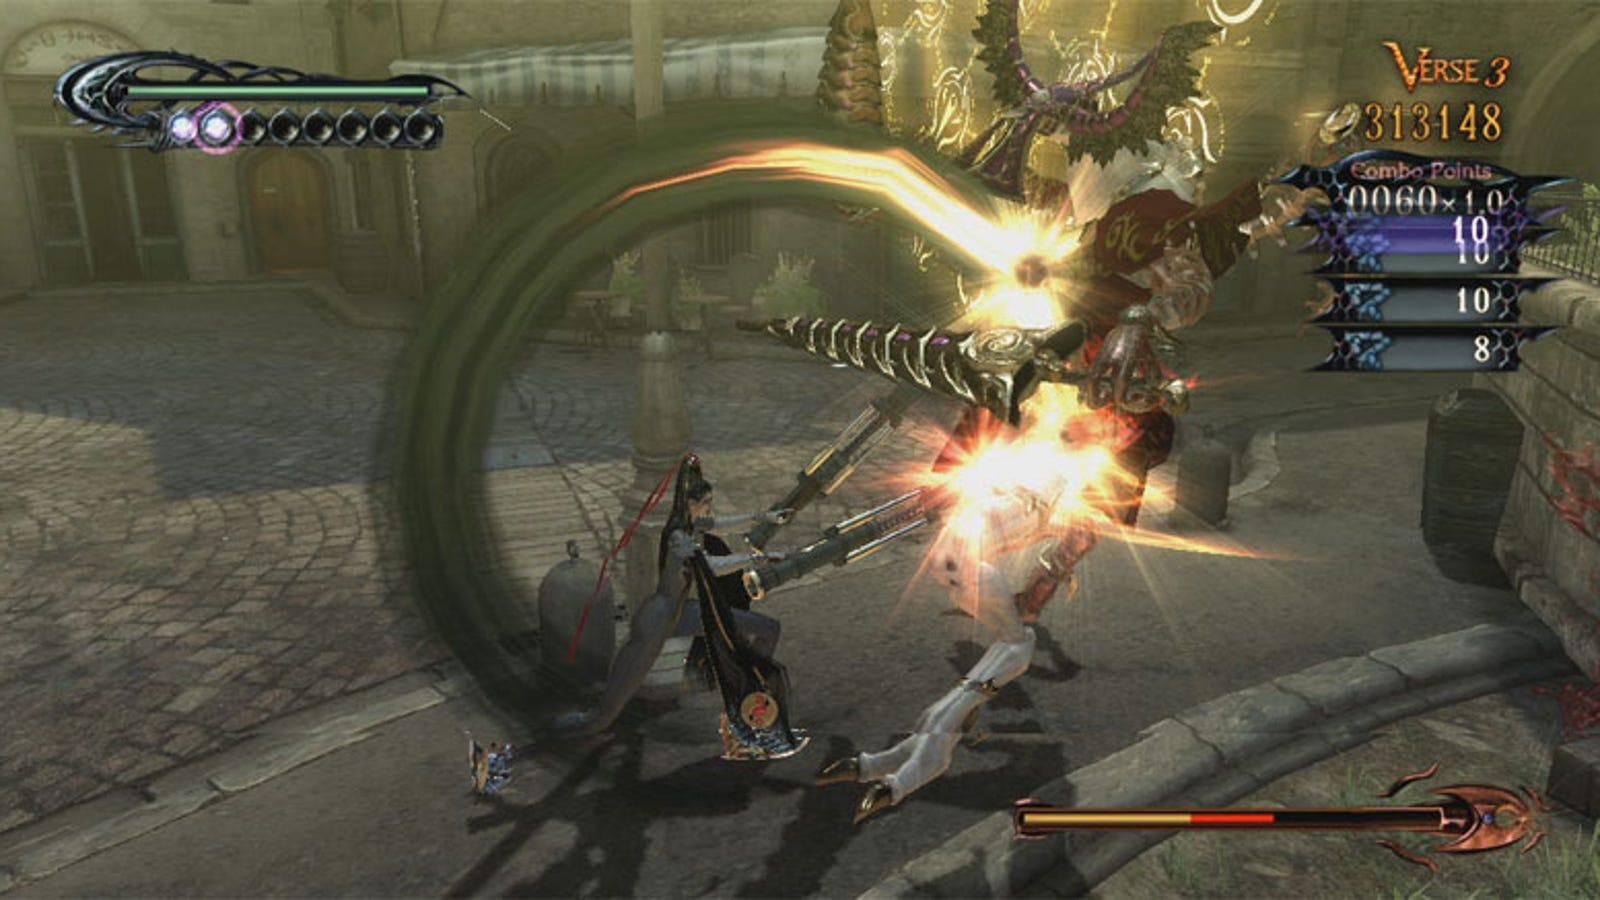 Sega: Yes, Bayonetta Will Be Region Locked